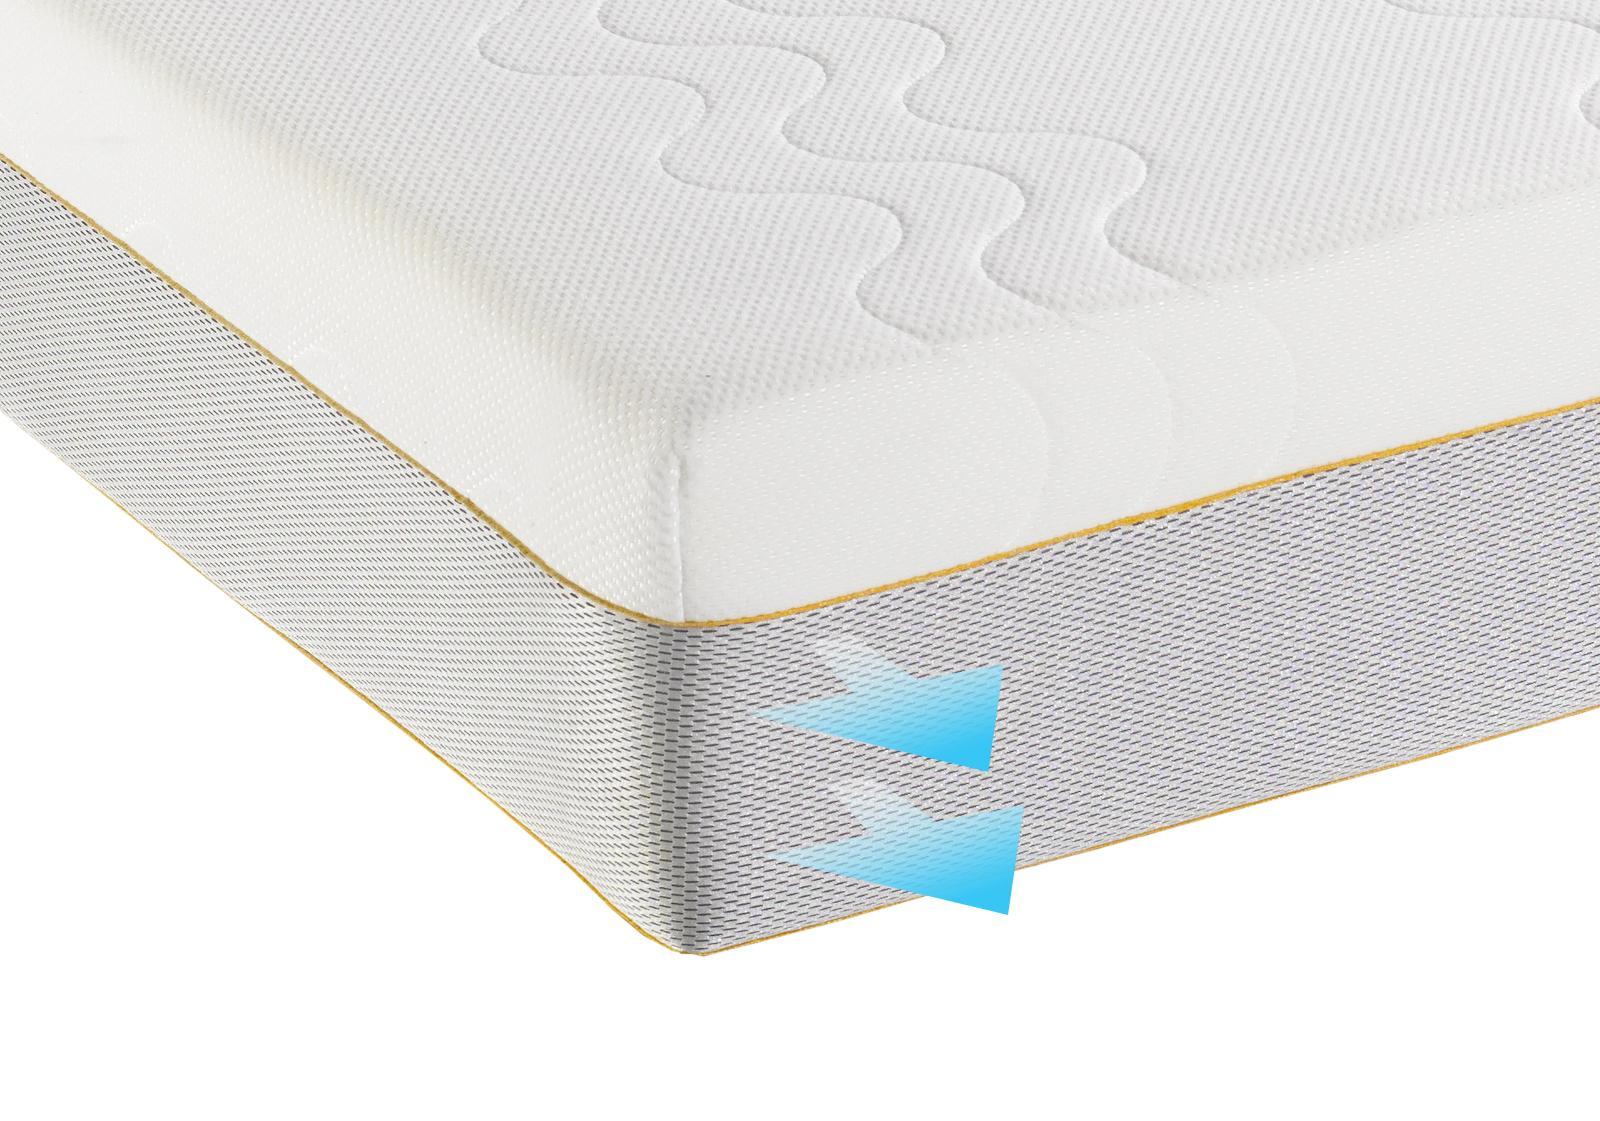 Dormeo Options Double Hybrid Mattress With Cotton White